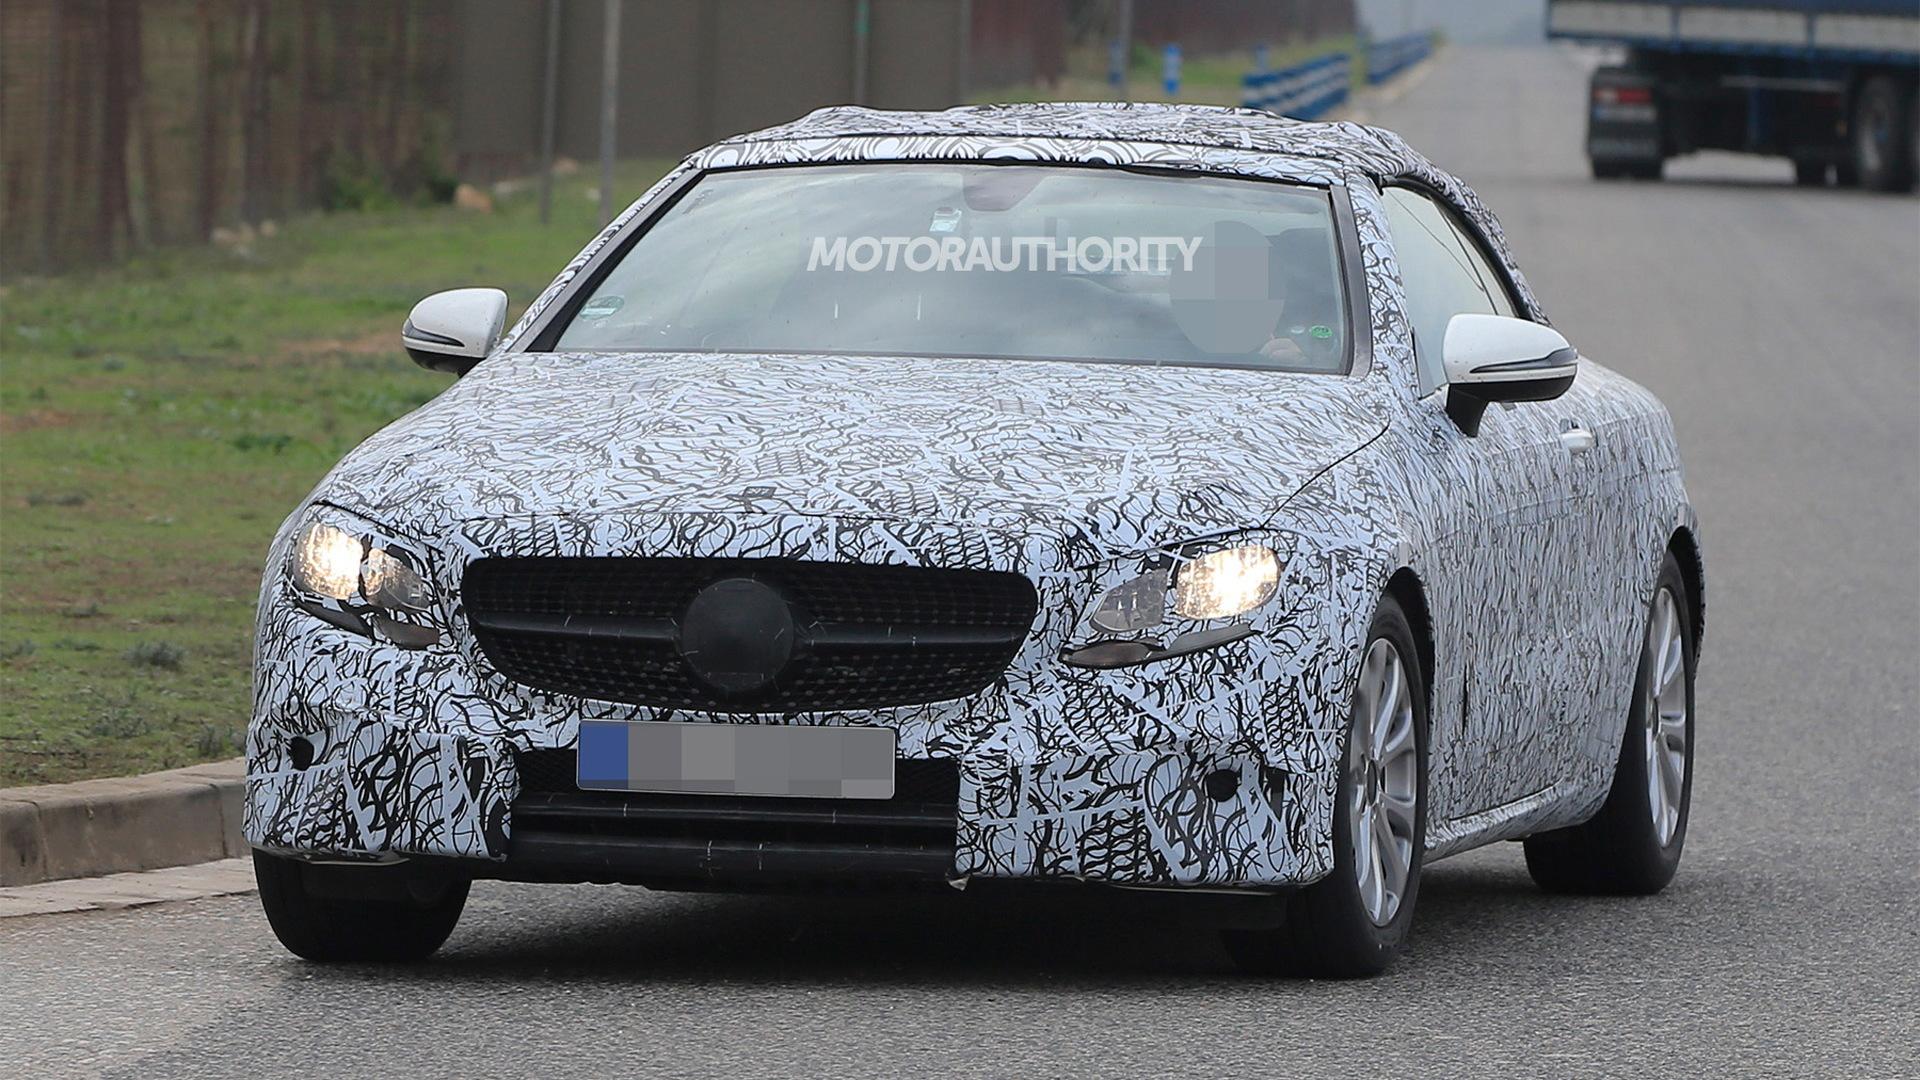 2018 Mercedes-Benz E-Class Cabriolet spy shots - Image via S. Baldauf/SB-Medien